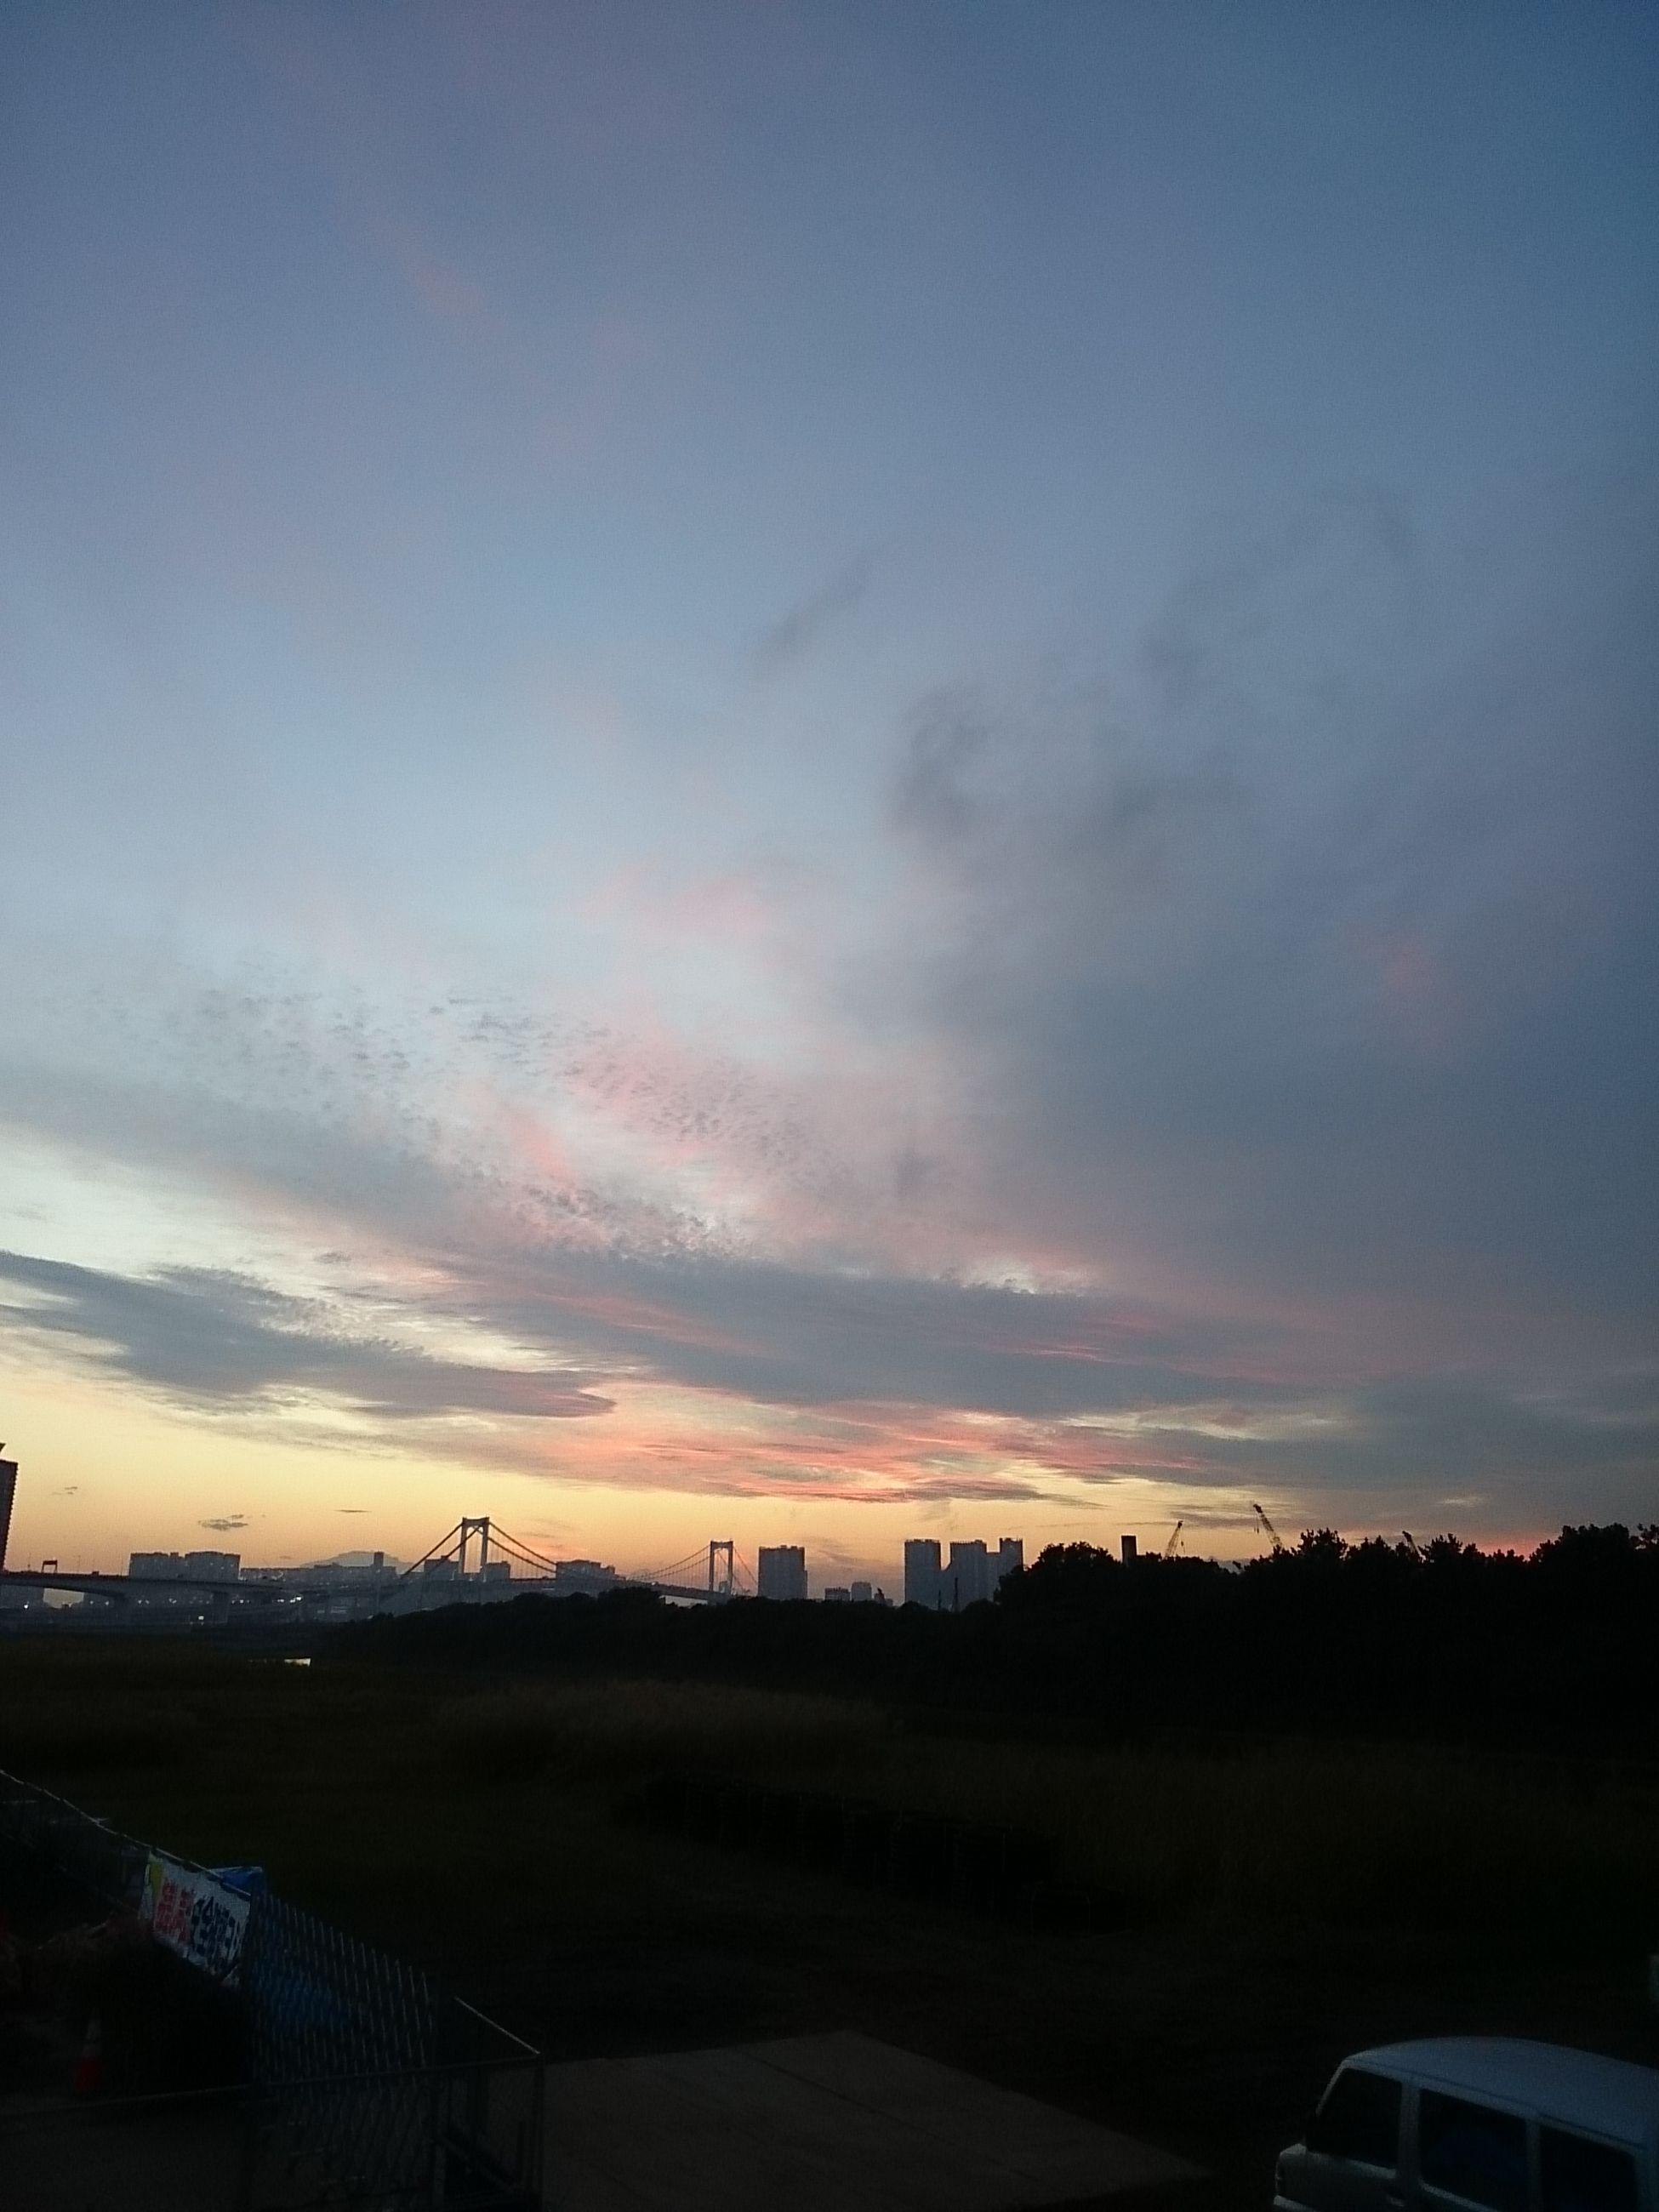 transportation, sky, car, road, land vehicle, mode of transport, sunset, street, mountain, cloud - sky, scenics, nature, sea, beauty in nature, outdoors, dusk, landscape, tranquil scene, travel, cloud